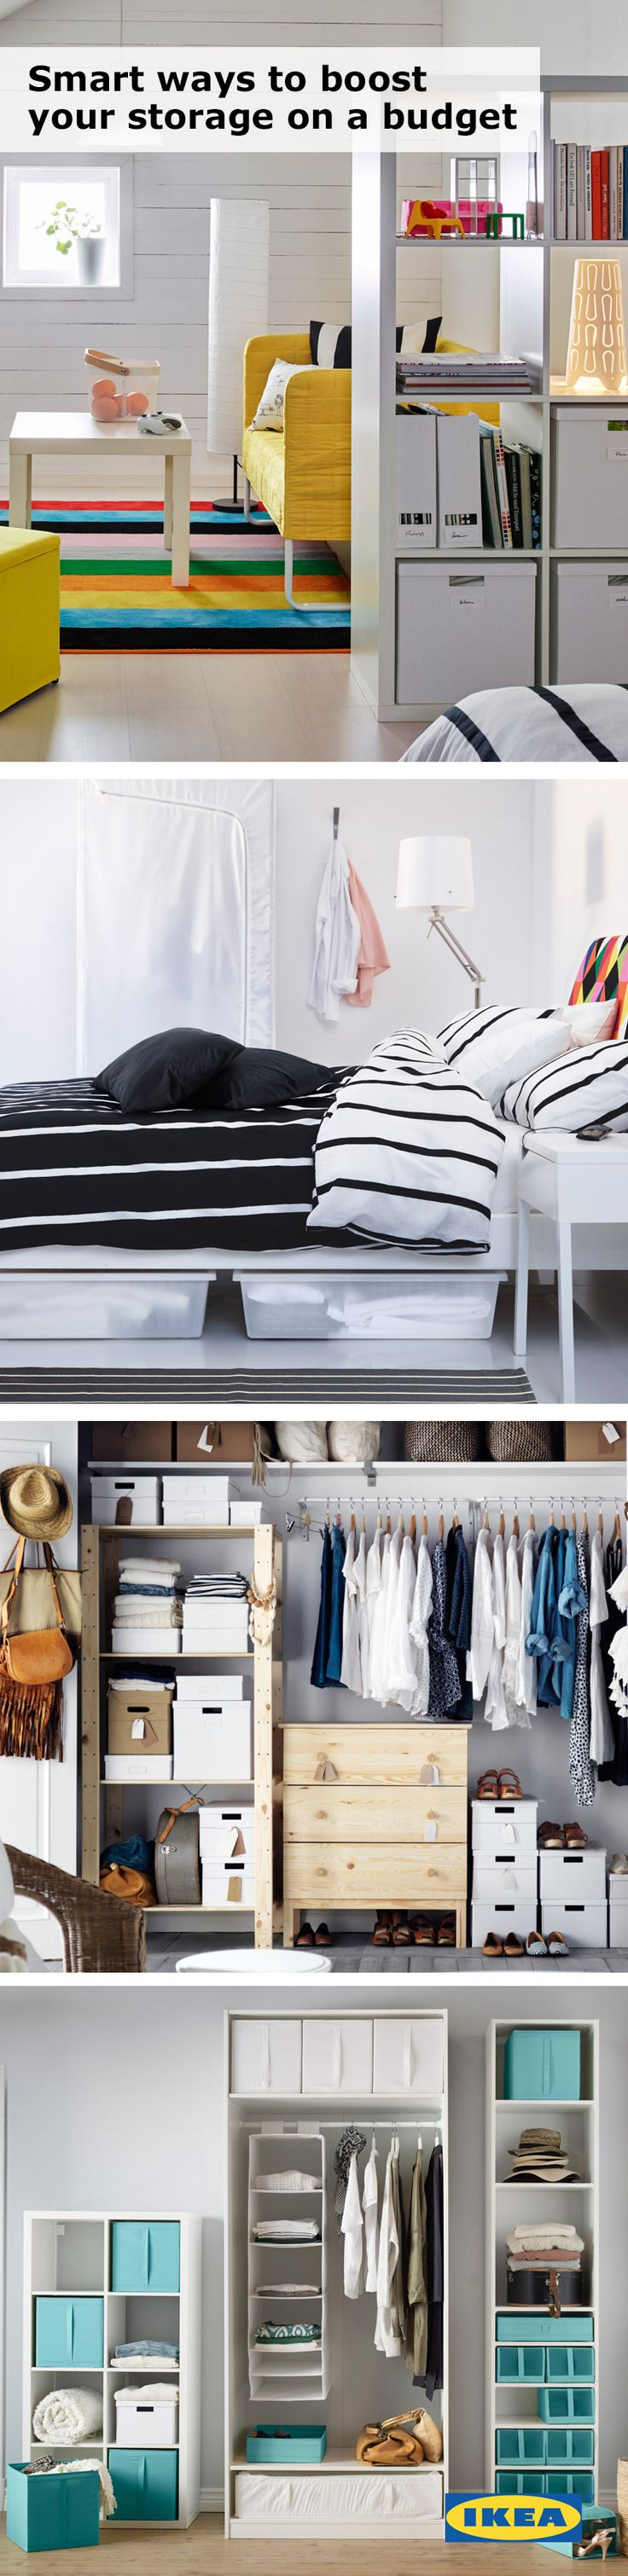 44 best guys dorm room ideas images on pinterest | guy dorm rooms